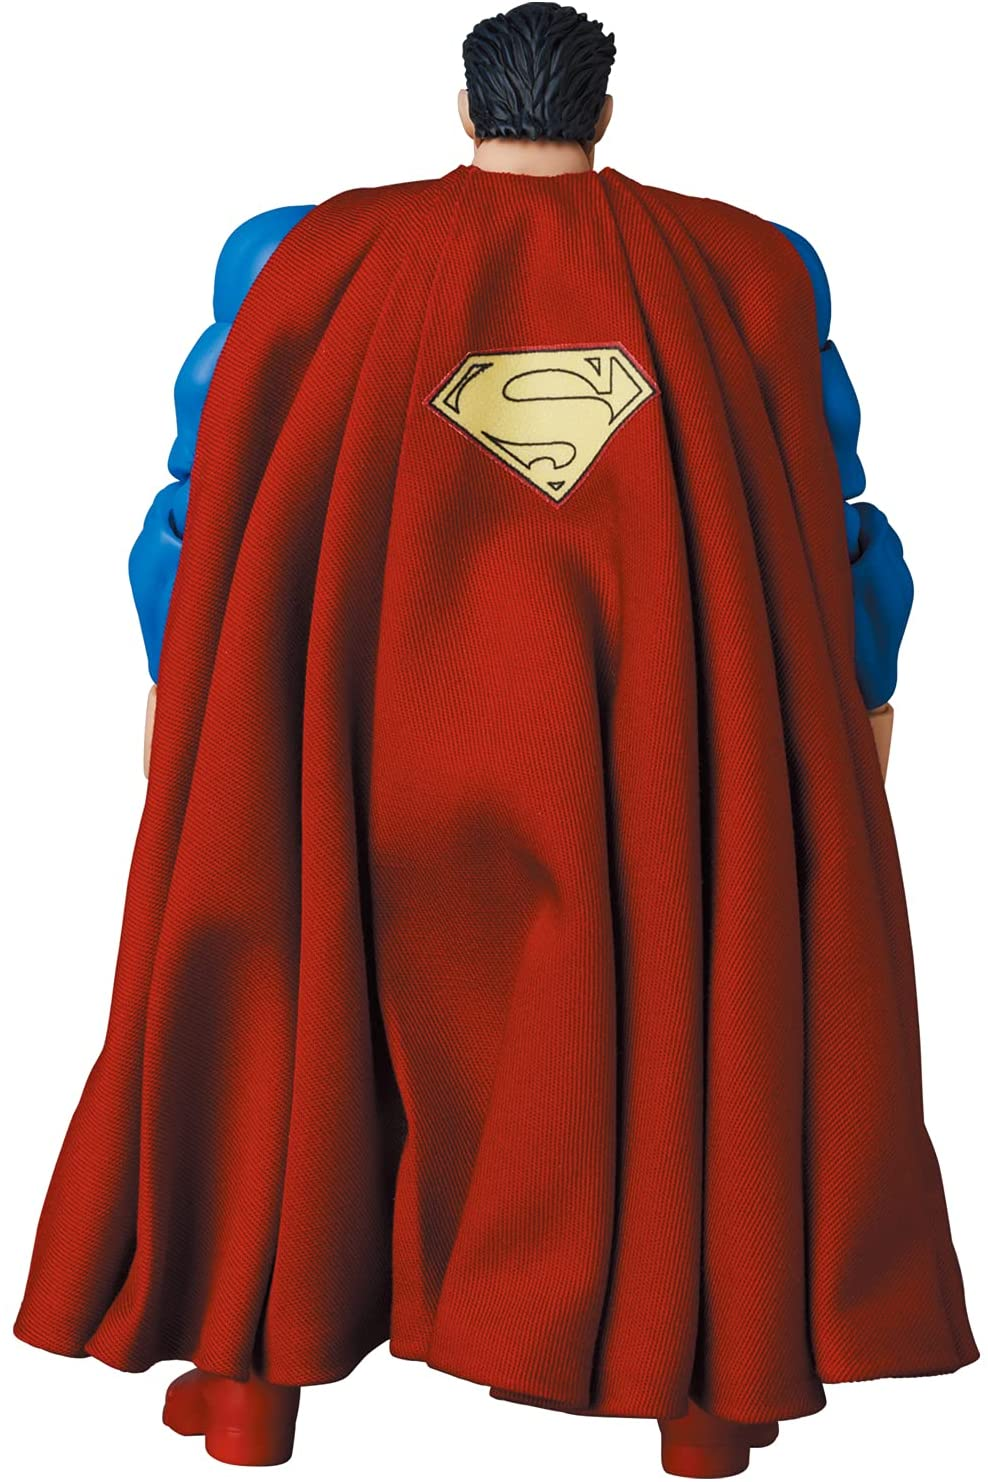 Link a Medicom_TDKR_Superman_03